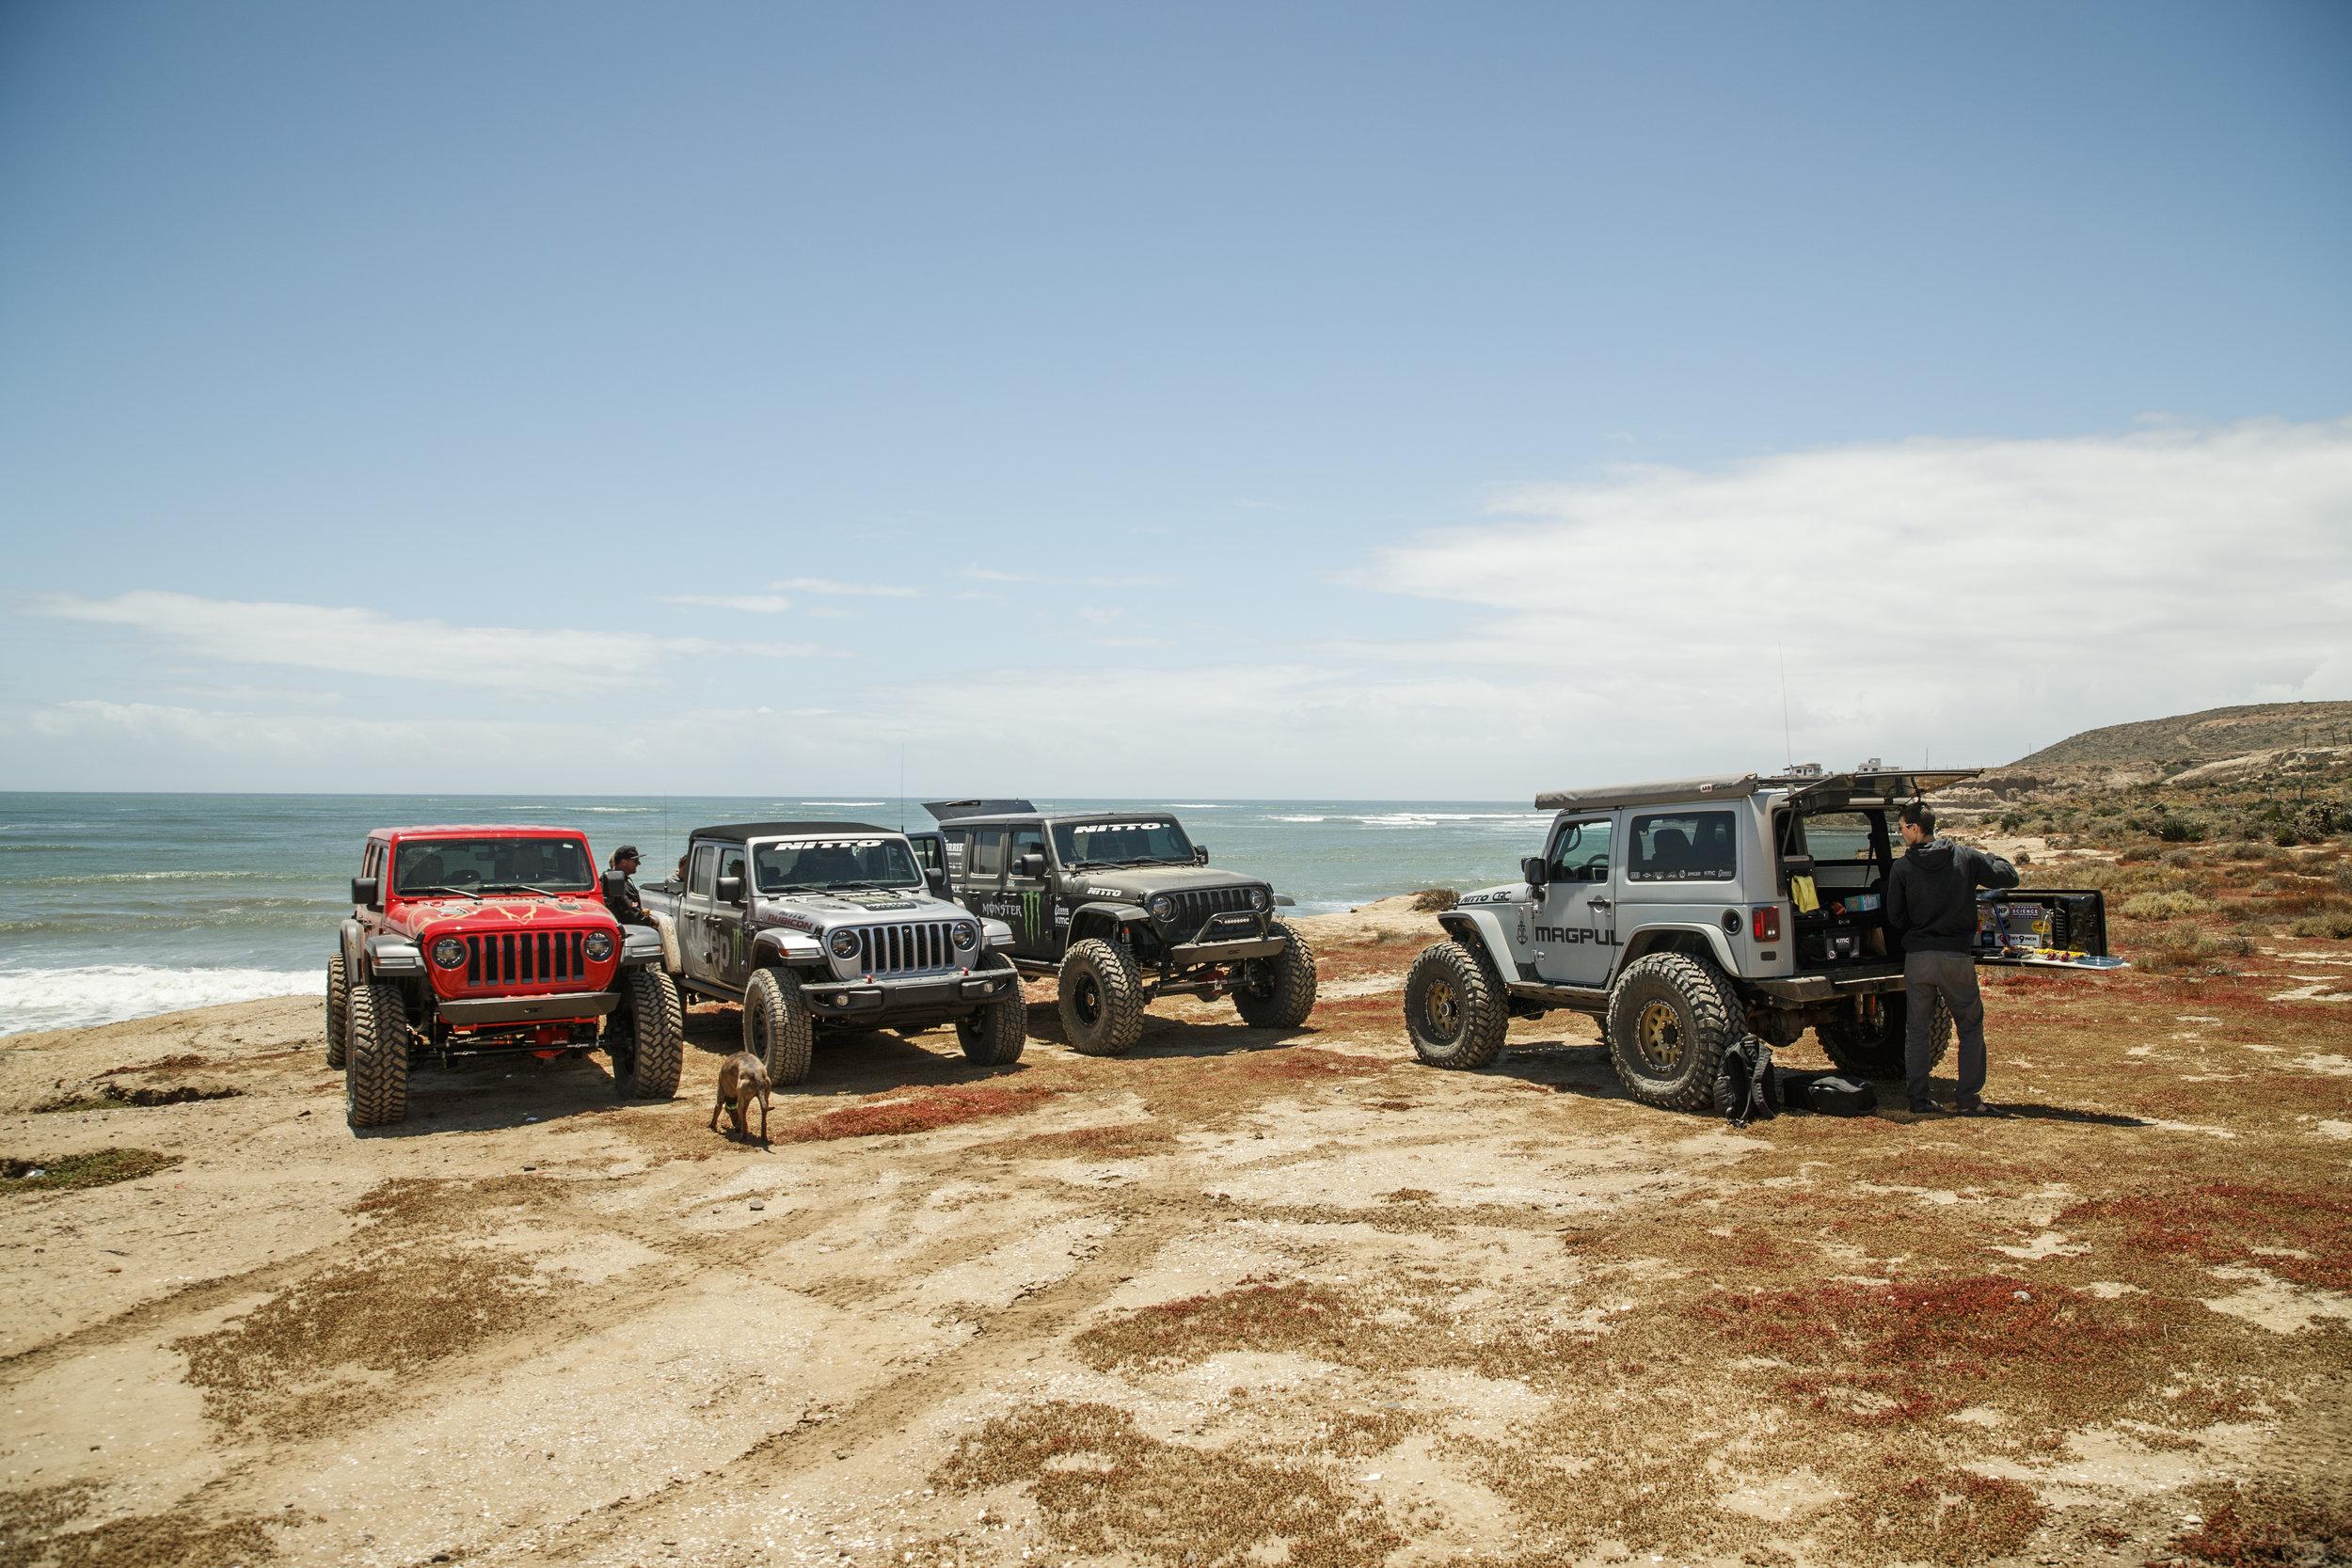 6_24_CaseyCurrie_Baja500PreRunning_BajaMexico_Jeep_022.jpg